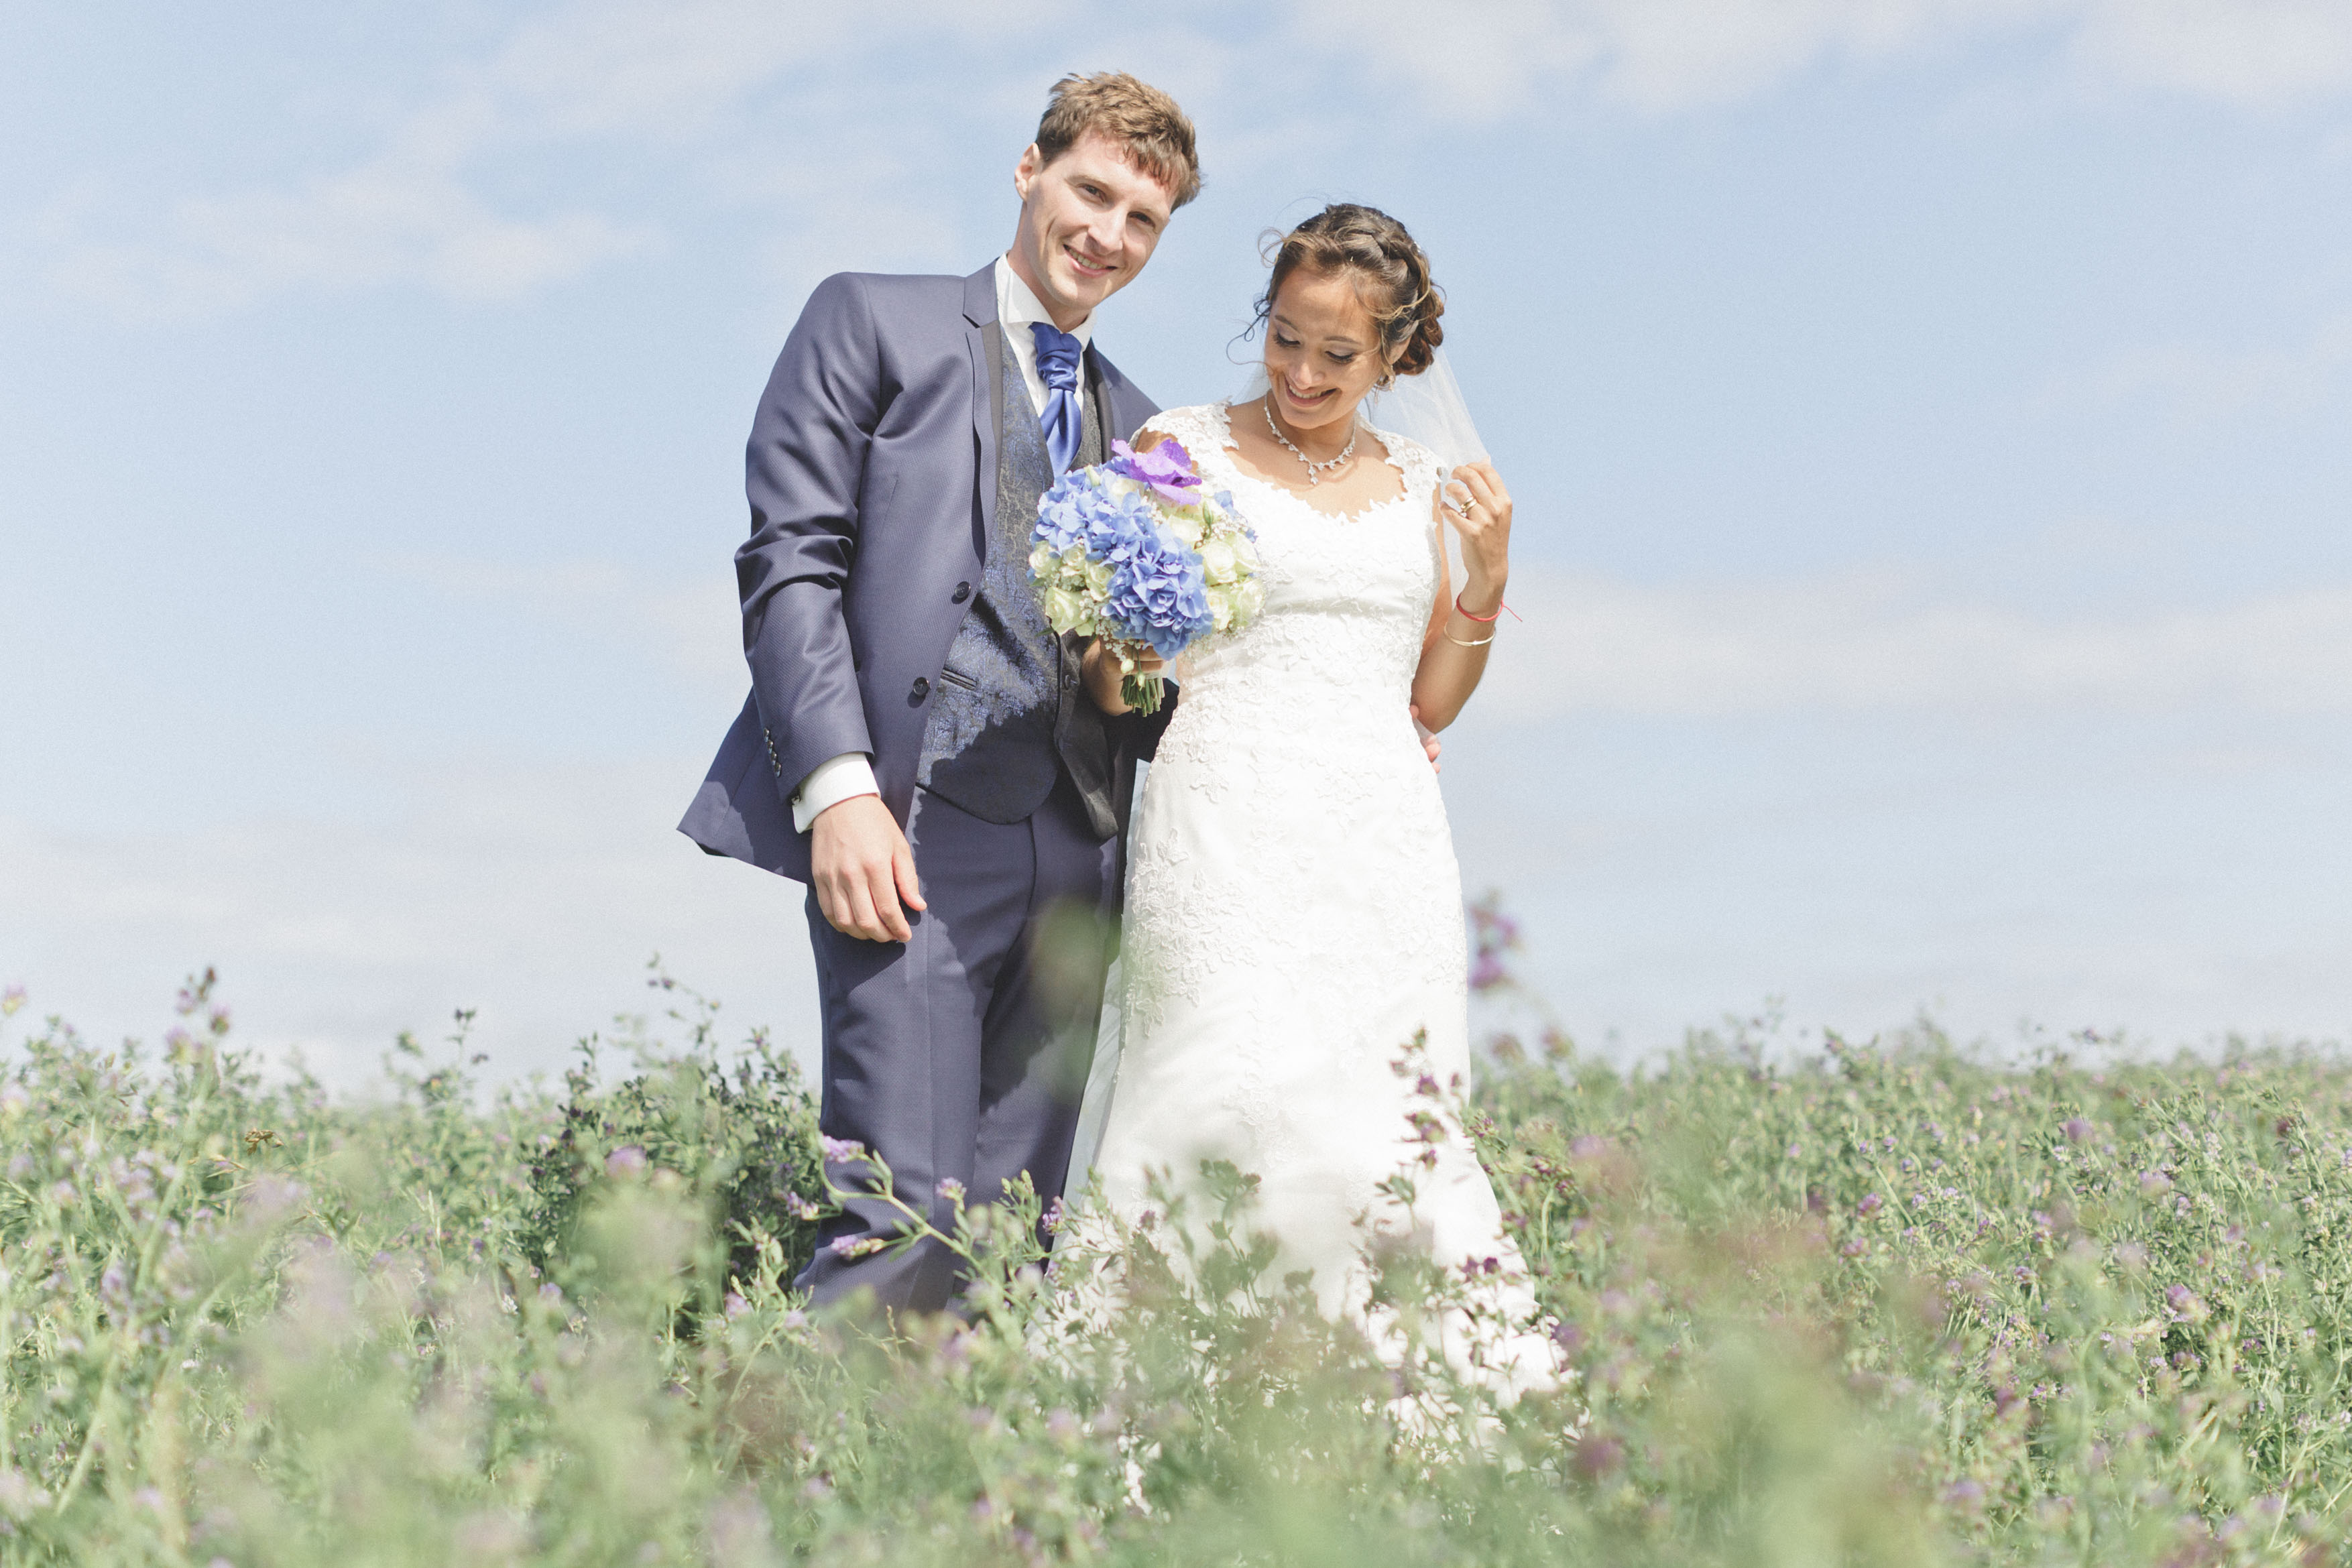 Photographie - Mariage - Bretagne - Finistere - Morbihan - Lilian Vezin Photographie (43)